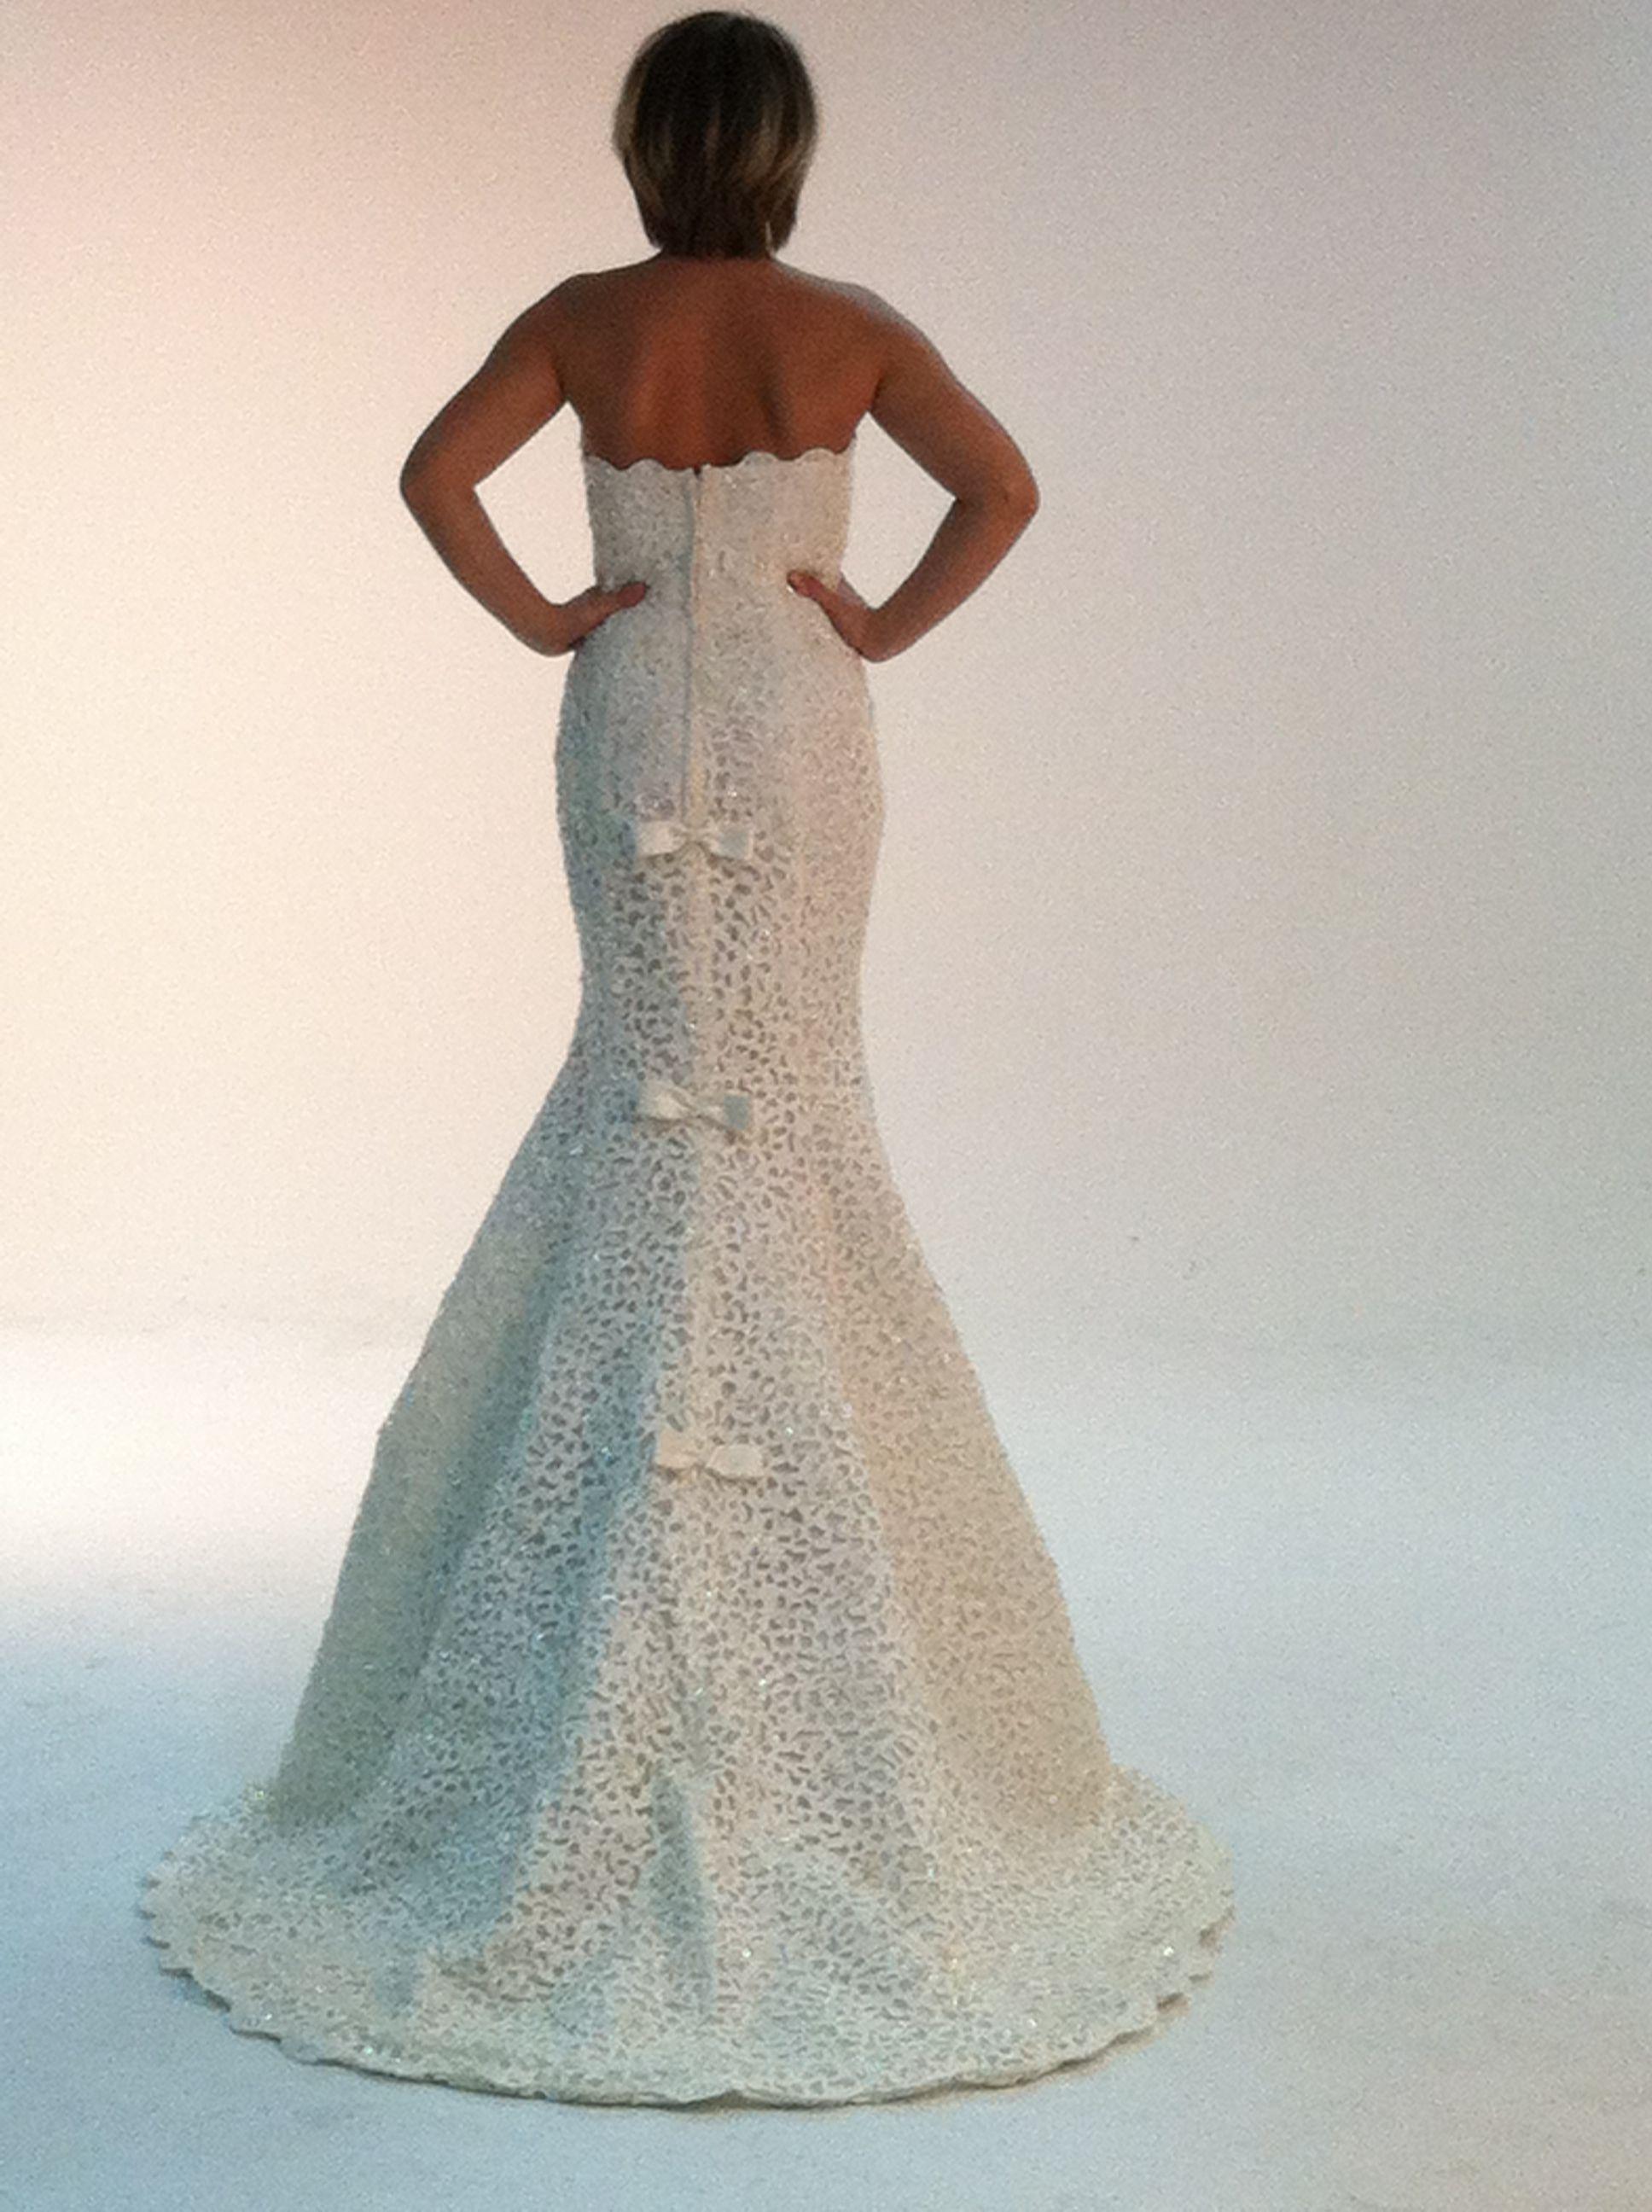 Precio de alquiler vestido de novia